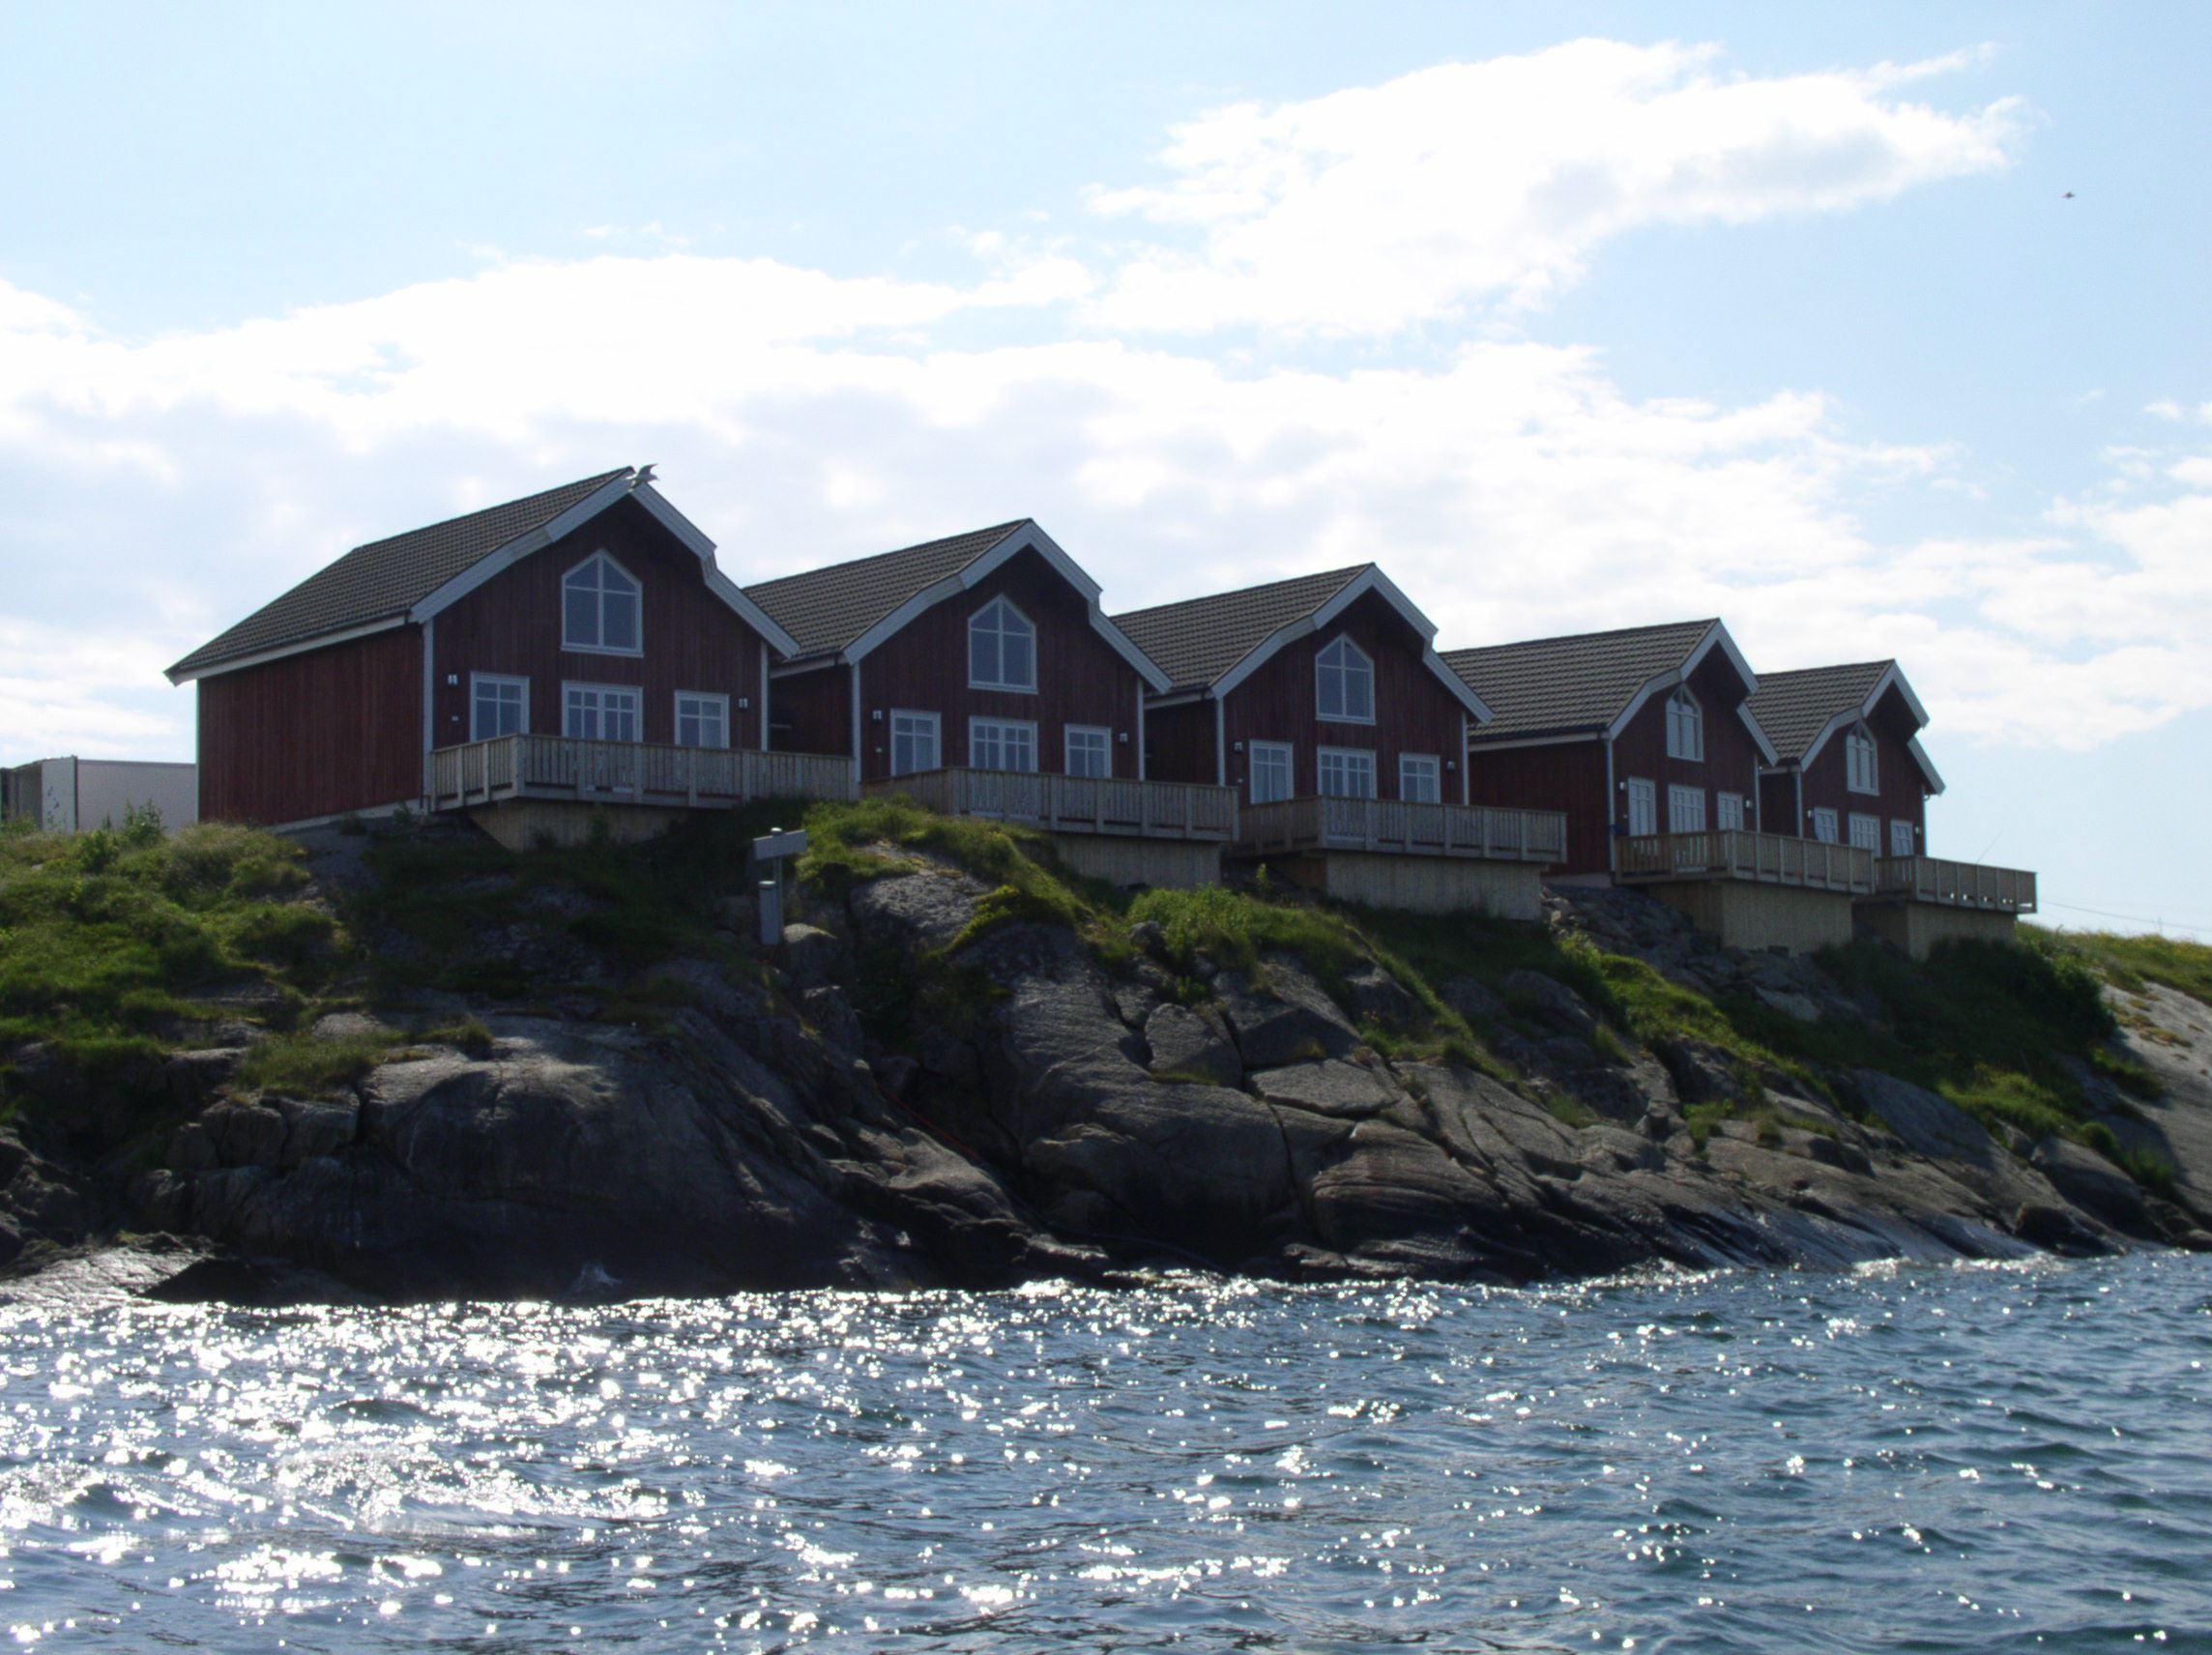 Kvarøy Sjøhus,  © Kvarøy Sjøhus, Kvarøy Sjøhus